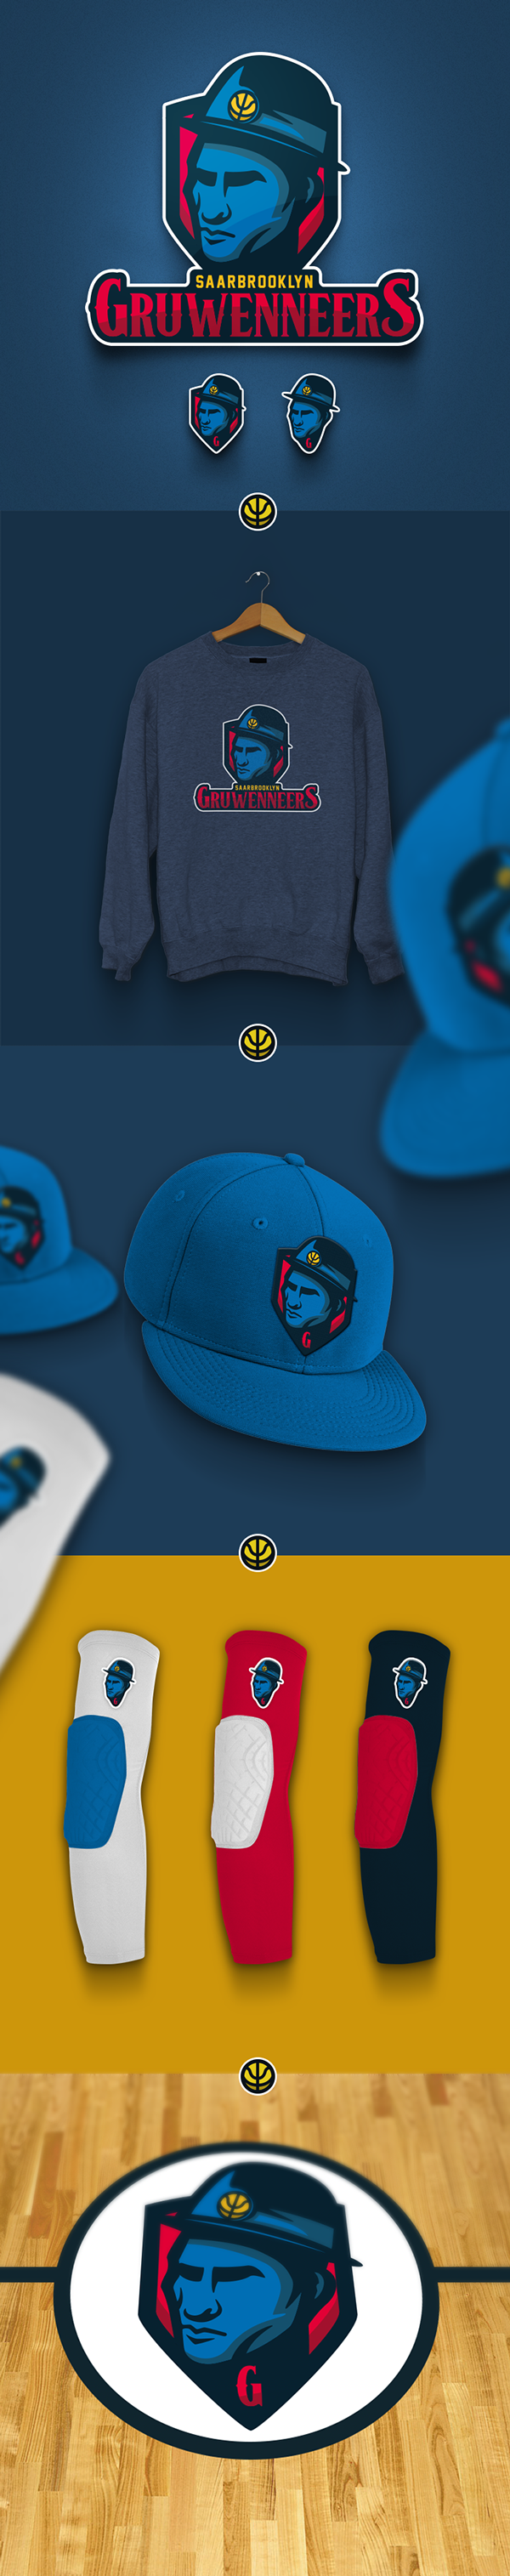 I M Ready For The Customization And Own Logo Upload In Nba2k16 Nba Basketball Team Logo Represent Saarland Saarland Design Custom